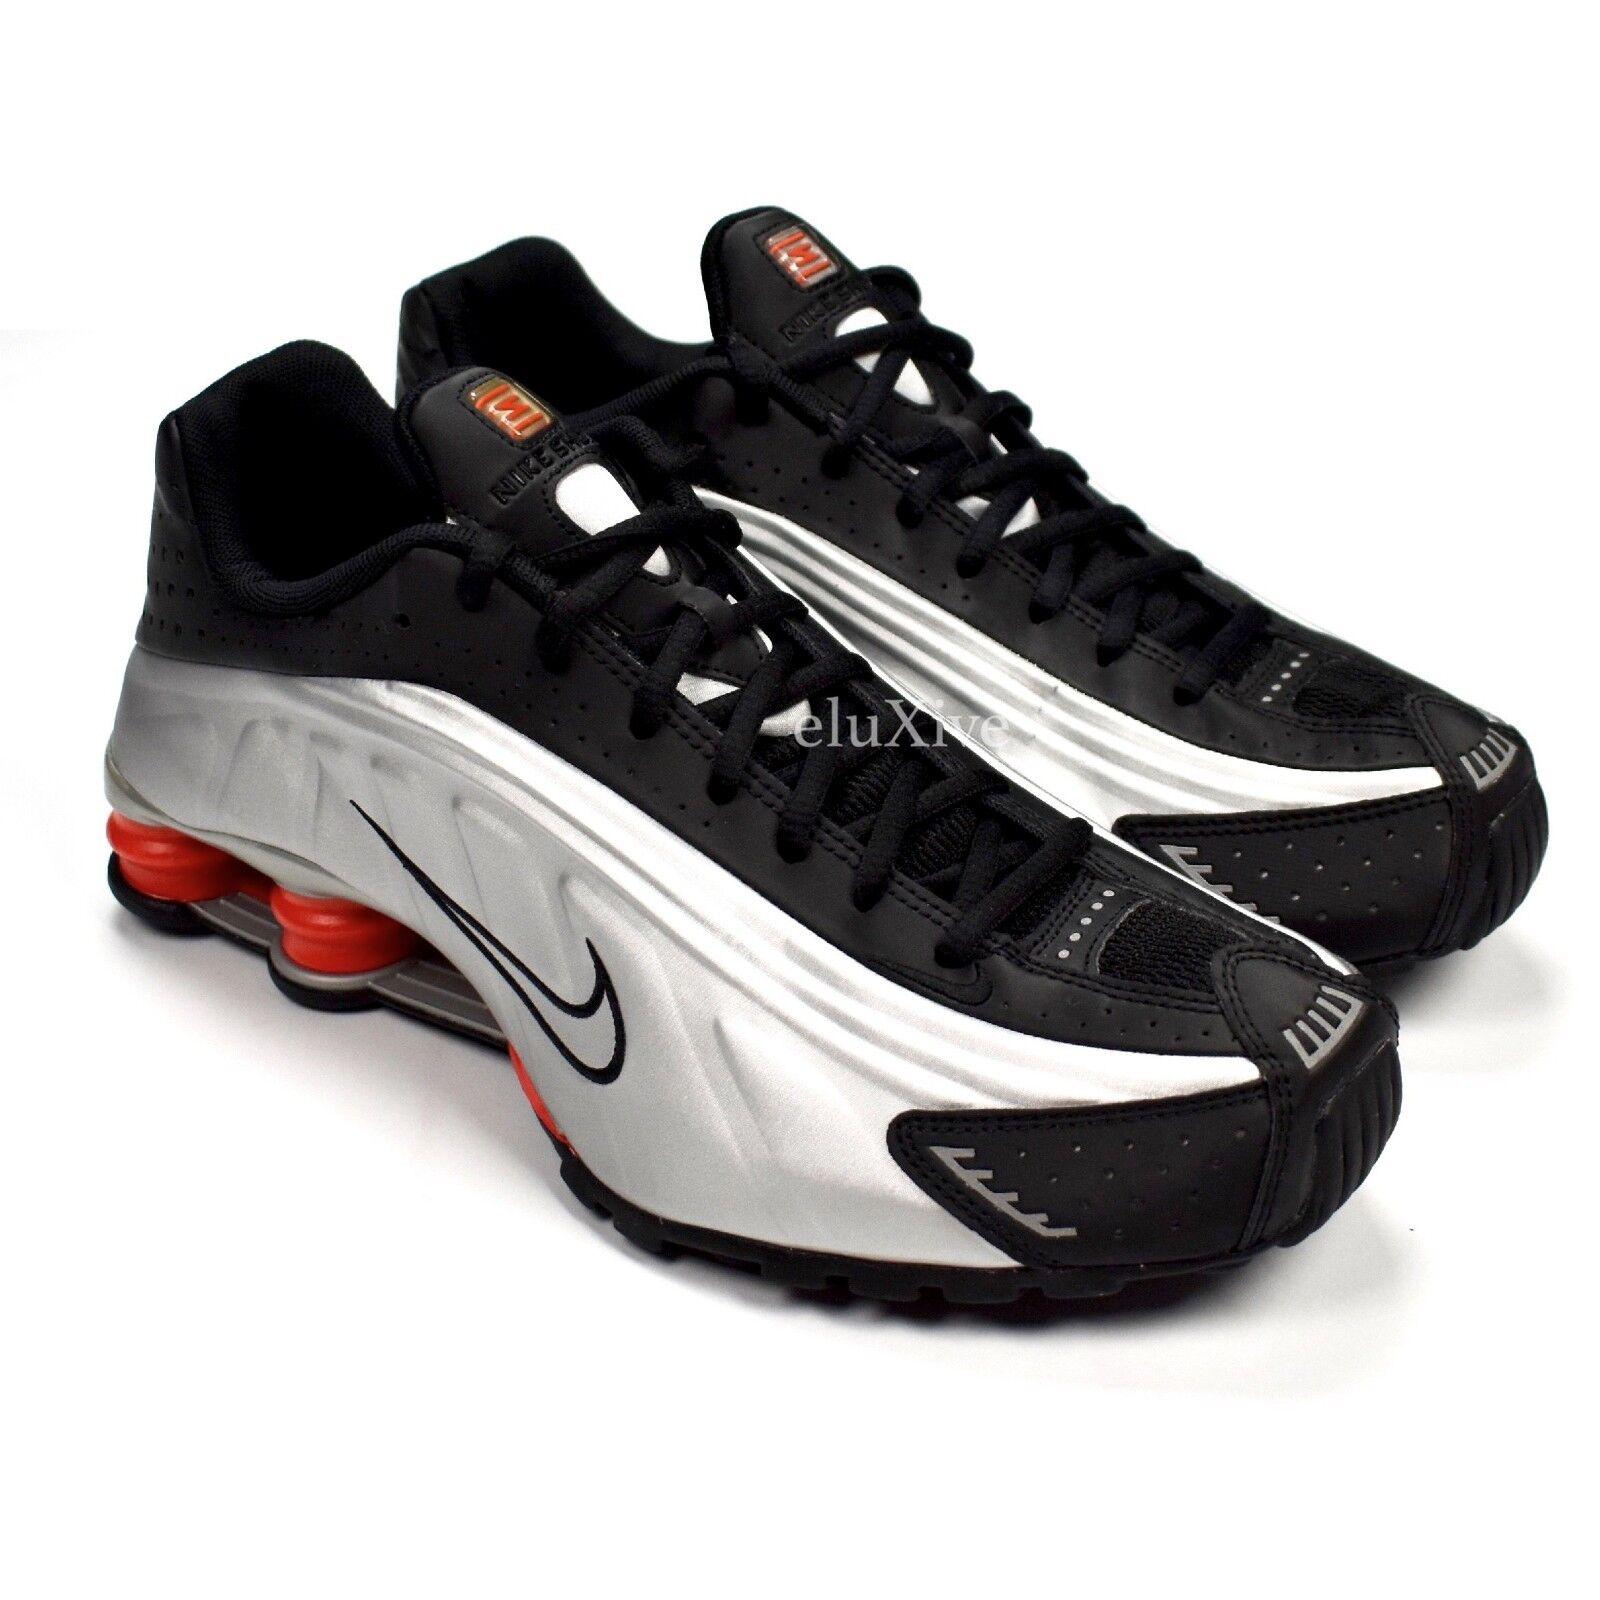 Nike Shox R4 hombres og plata de metalico, negro, naranja, zapatillas de plata deporte 10 DS 2018 auténtica liquidación de temporada dc0ecb